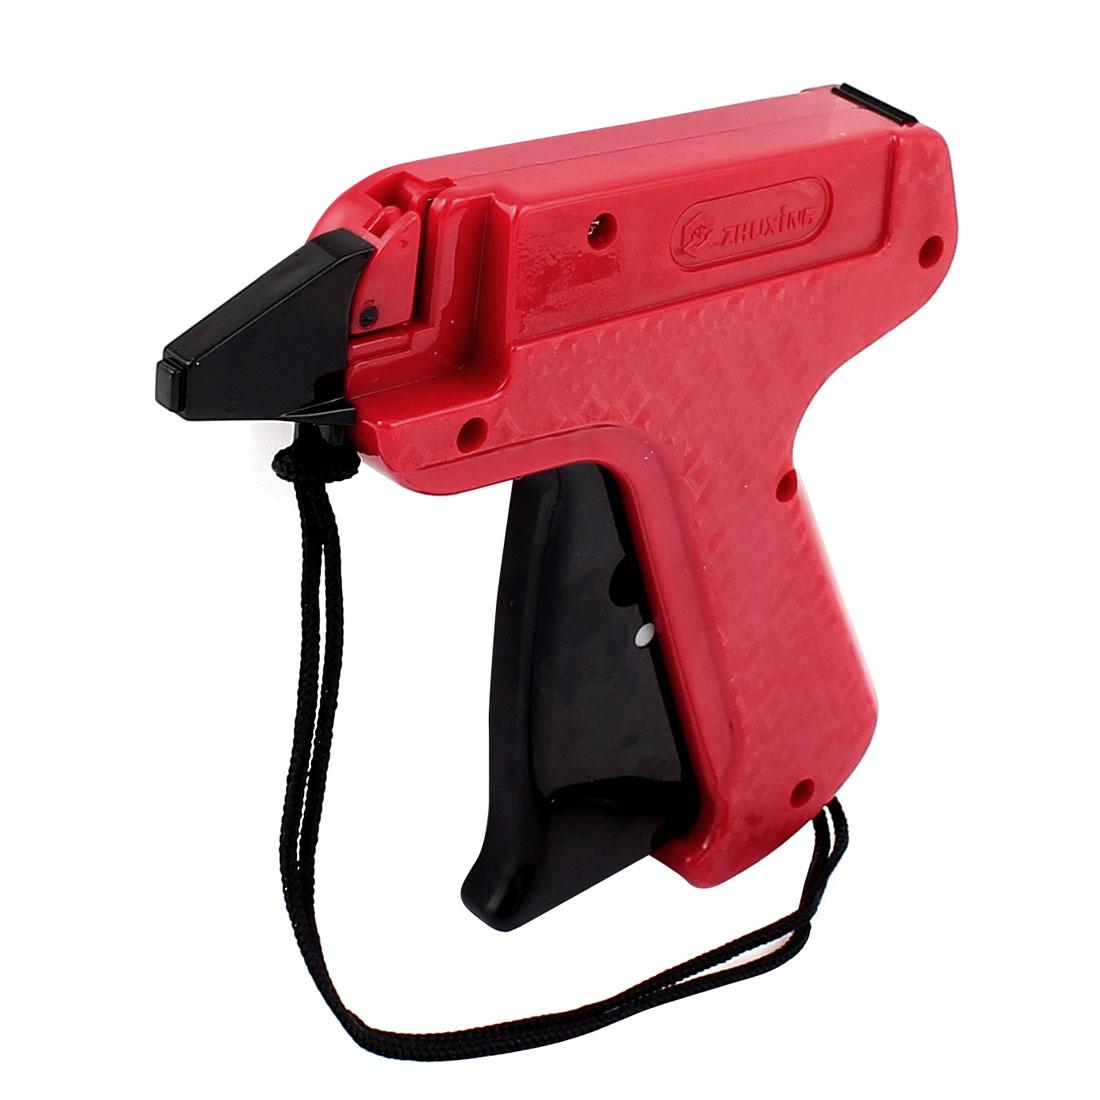 Black Red Plastic Garment Price Labelling 668 Tagging Gun w Lifting Rope